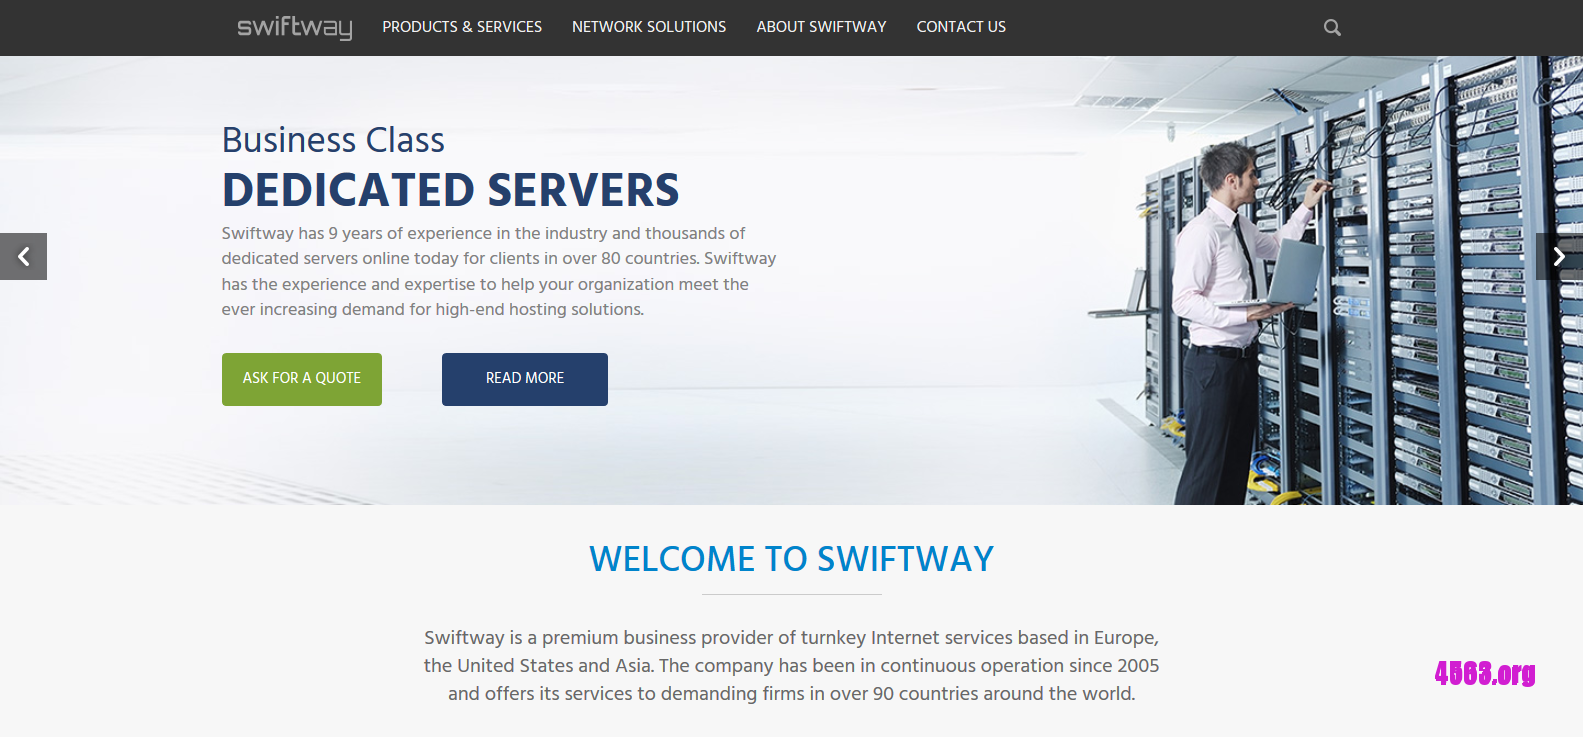 Swiftway荷兰独服@Dual 2620/64GB内存/8TB硬盘/10TB流量@$99/月